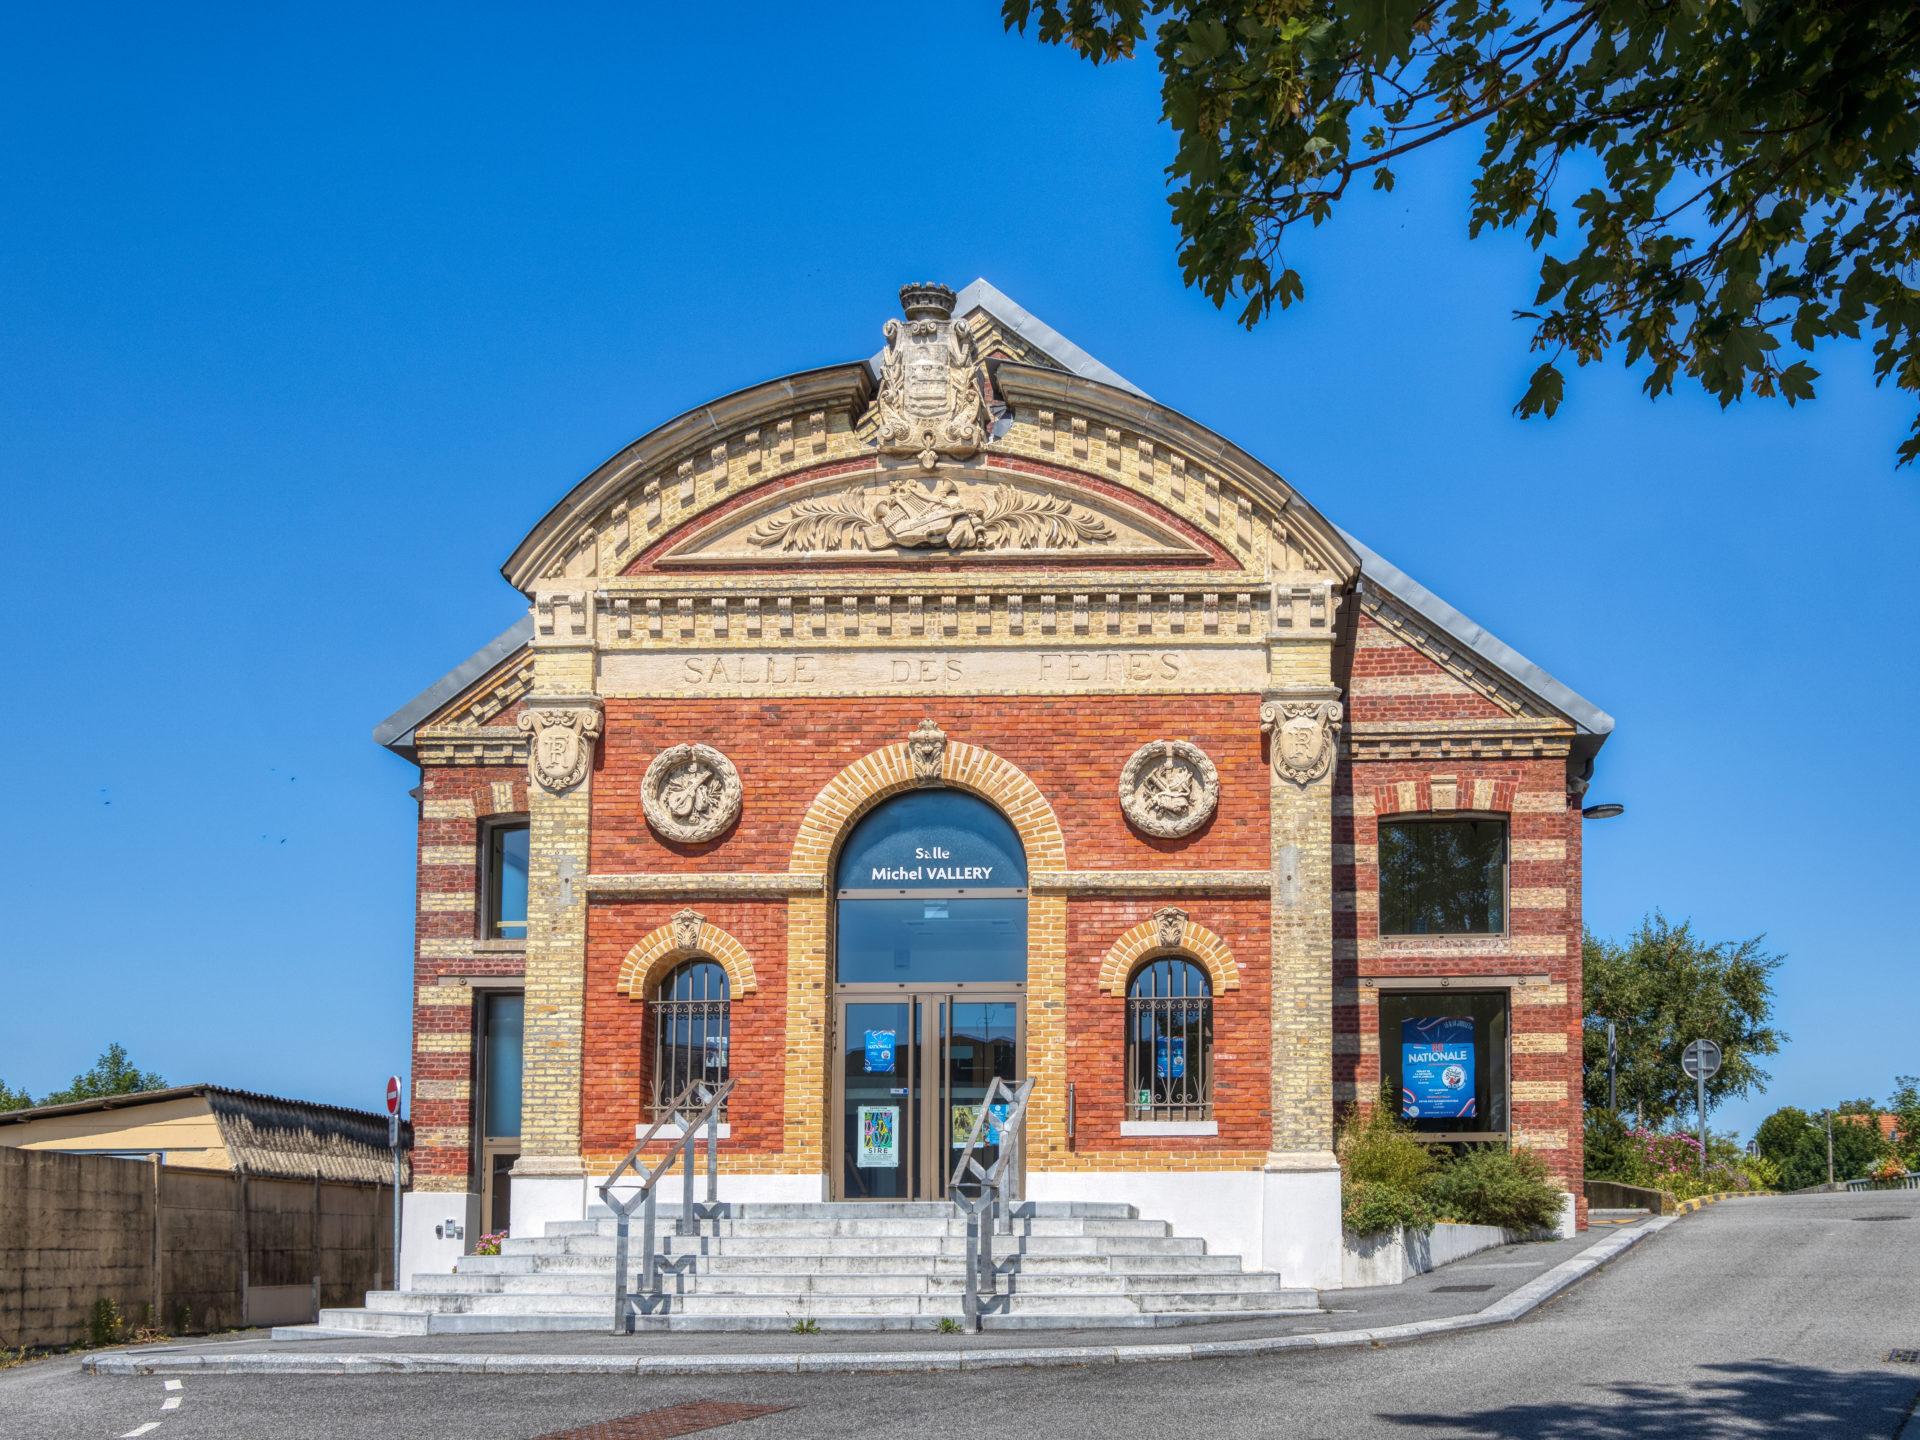 Salle Michel Vallery Montivilliers©Jacques Basile